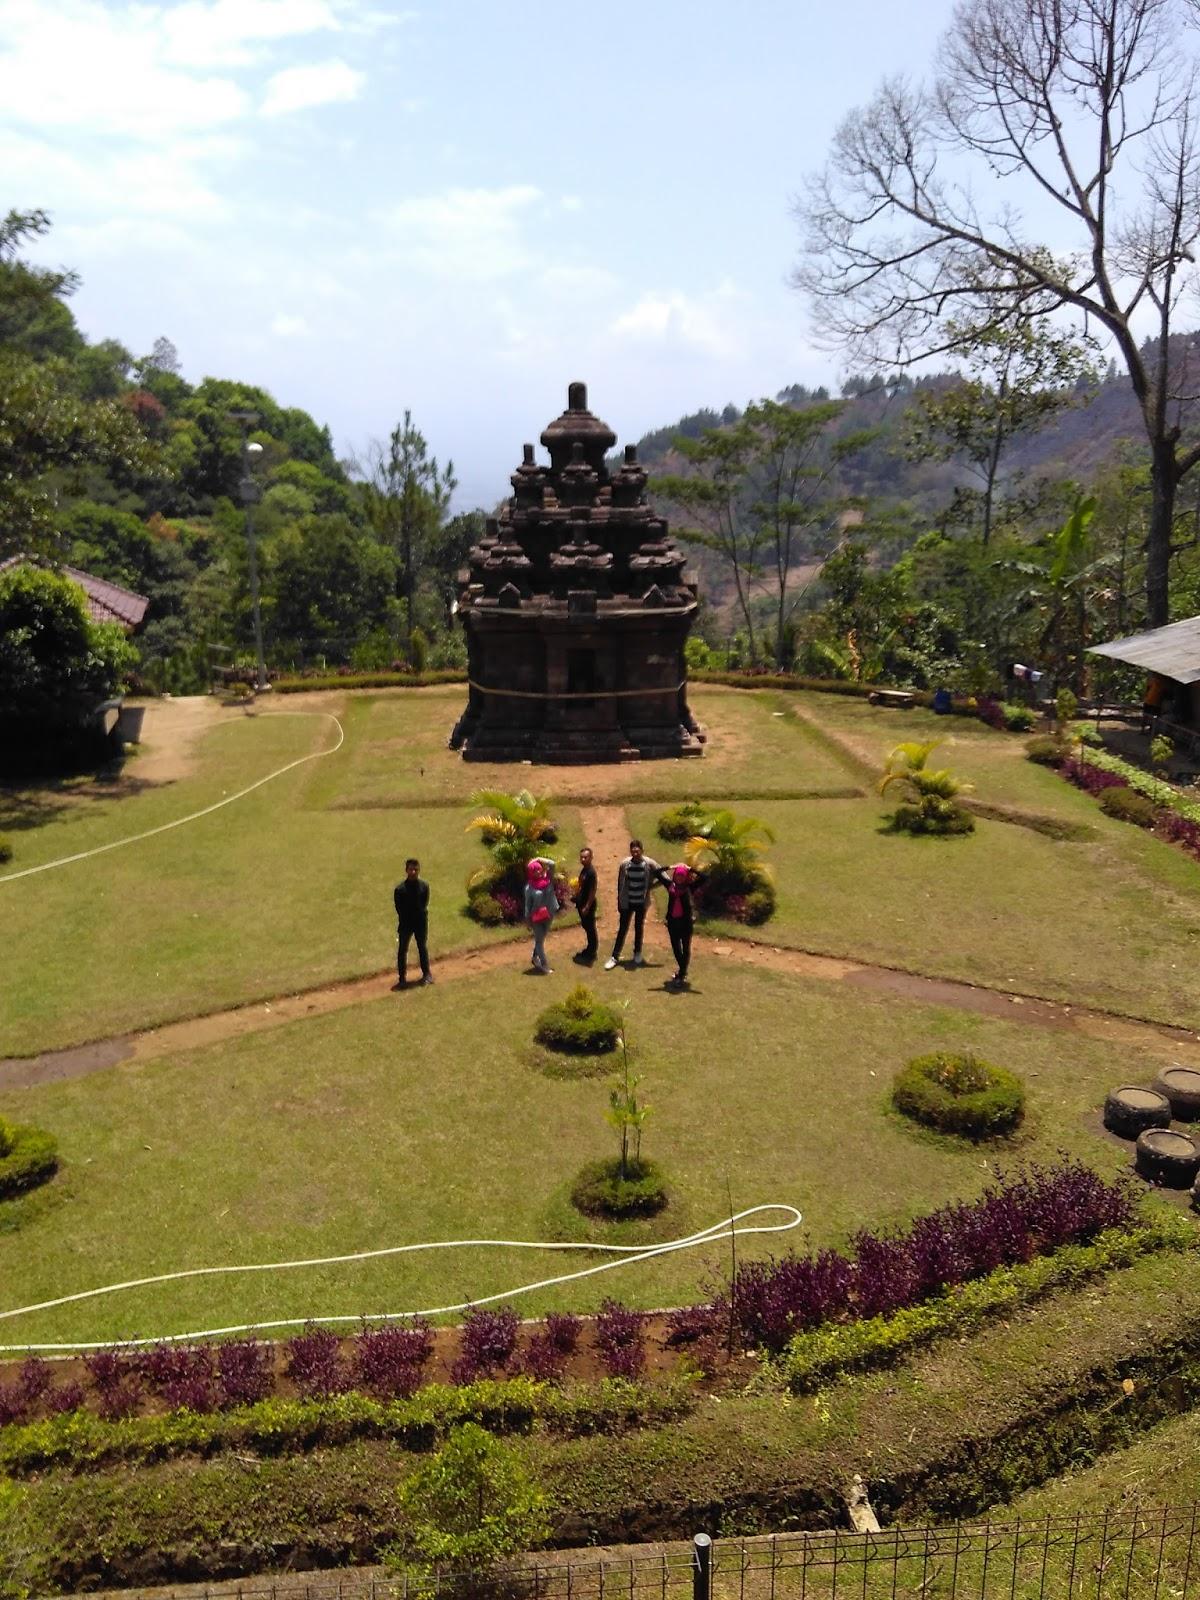 Candi Selogriyo Mungil Eksotis Enjoy Jawa Tengah Secara Administratif Berada